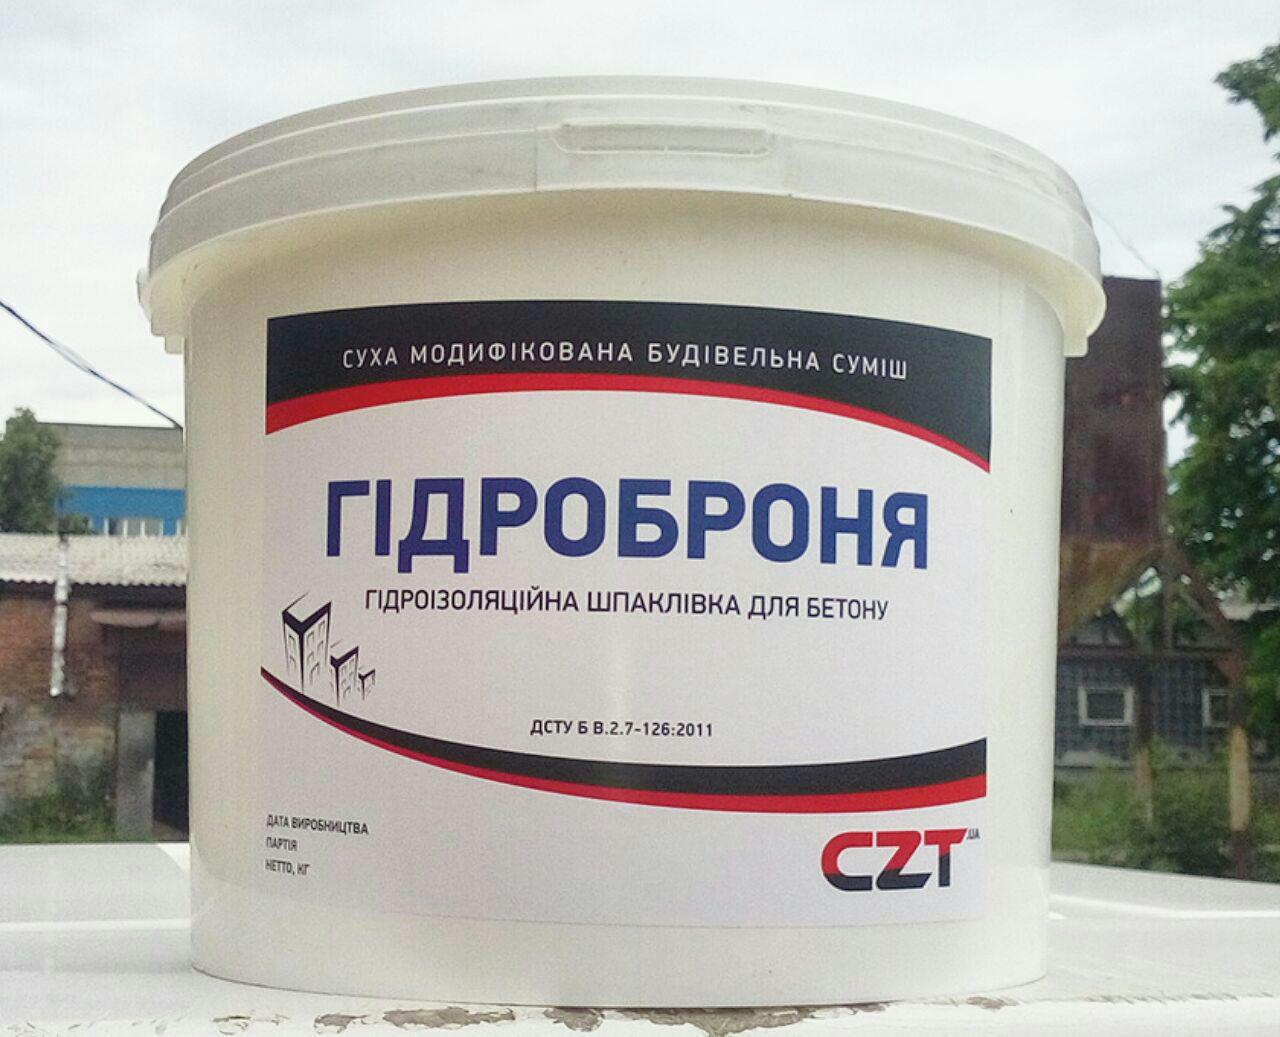 ГИДРОБРОНЯ (Белый, 5кг) Гидроизоляция для бетона